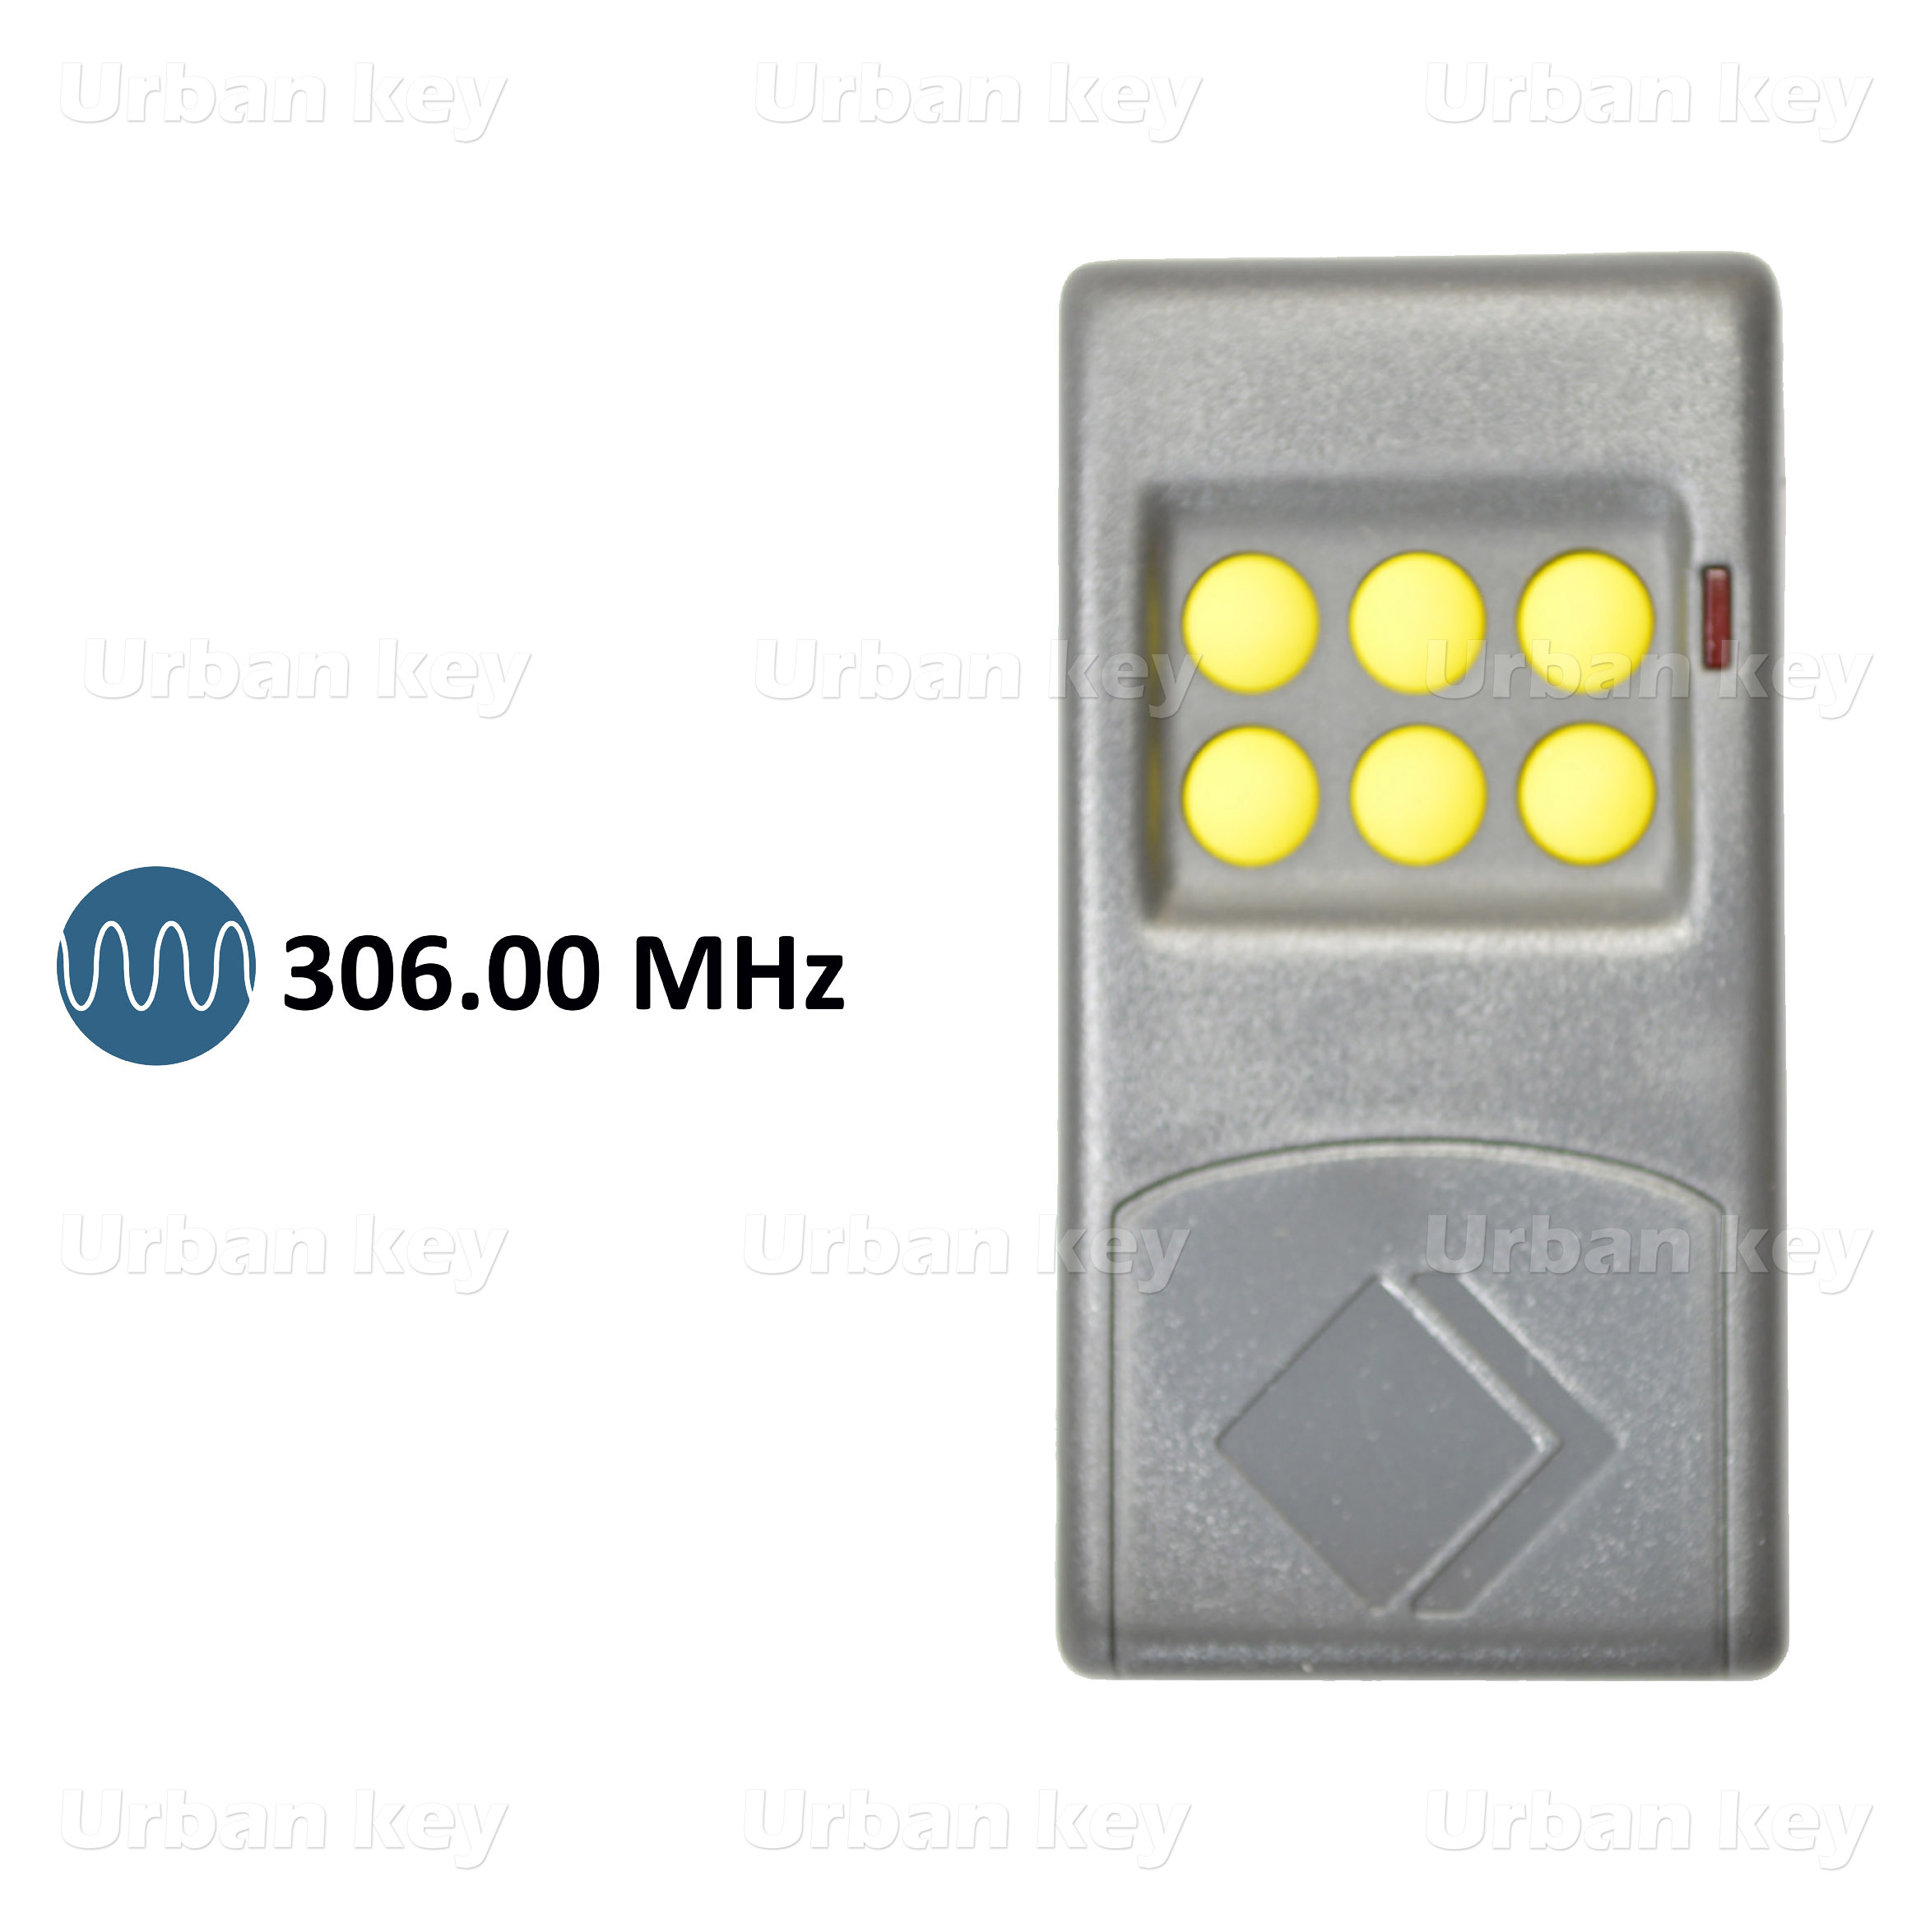 EMISSOR MOTORLINE MX6 306MHZ 6 CANAIS